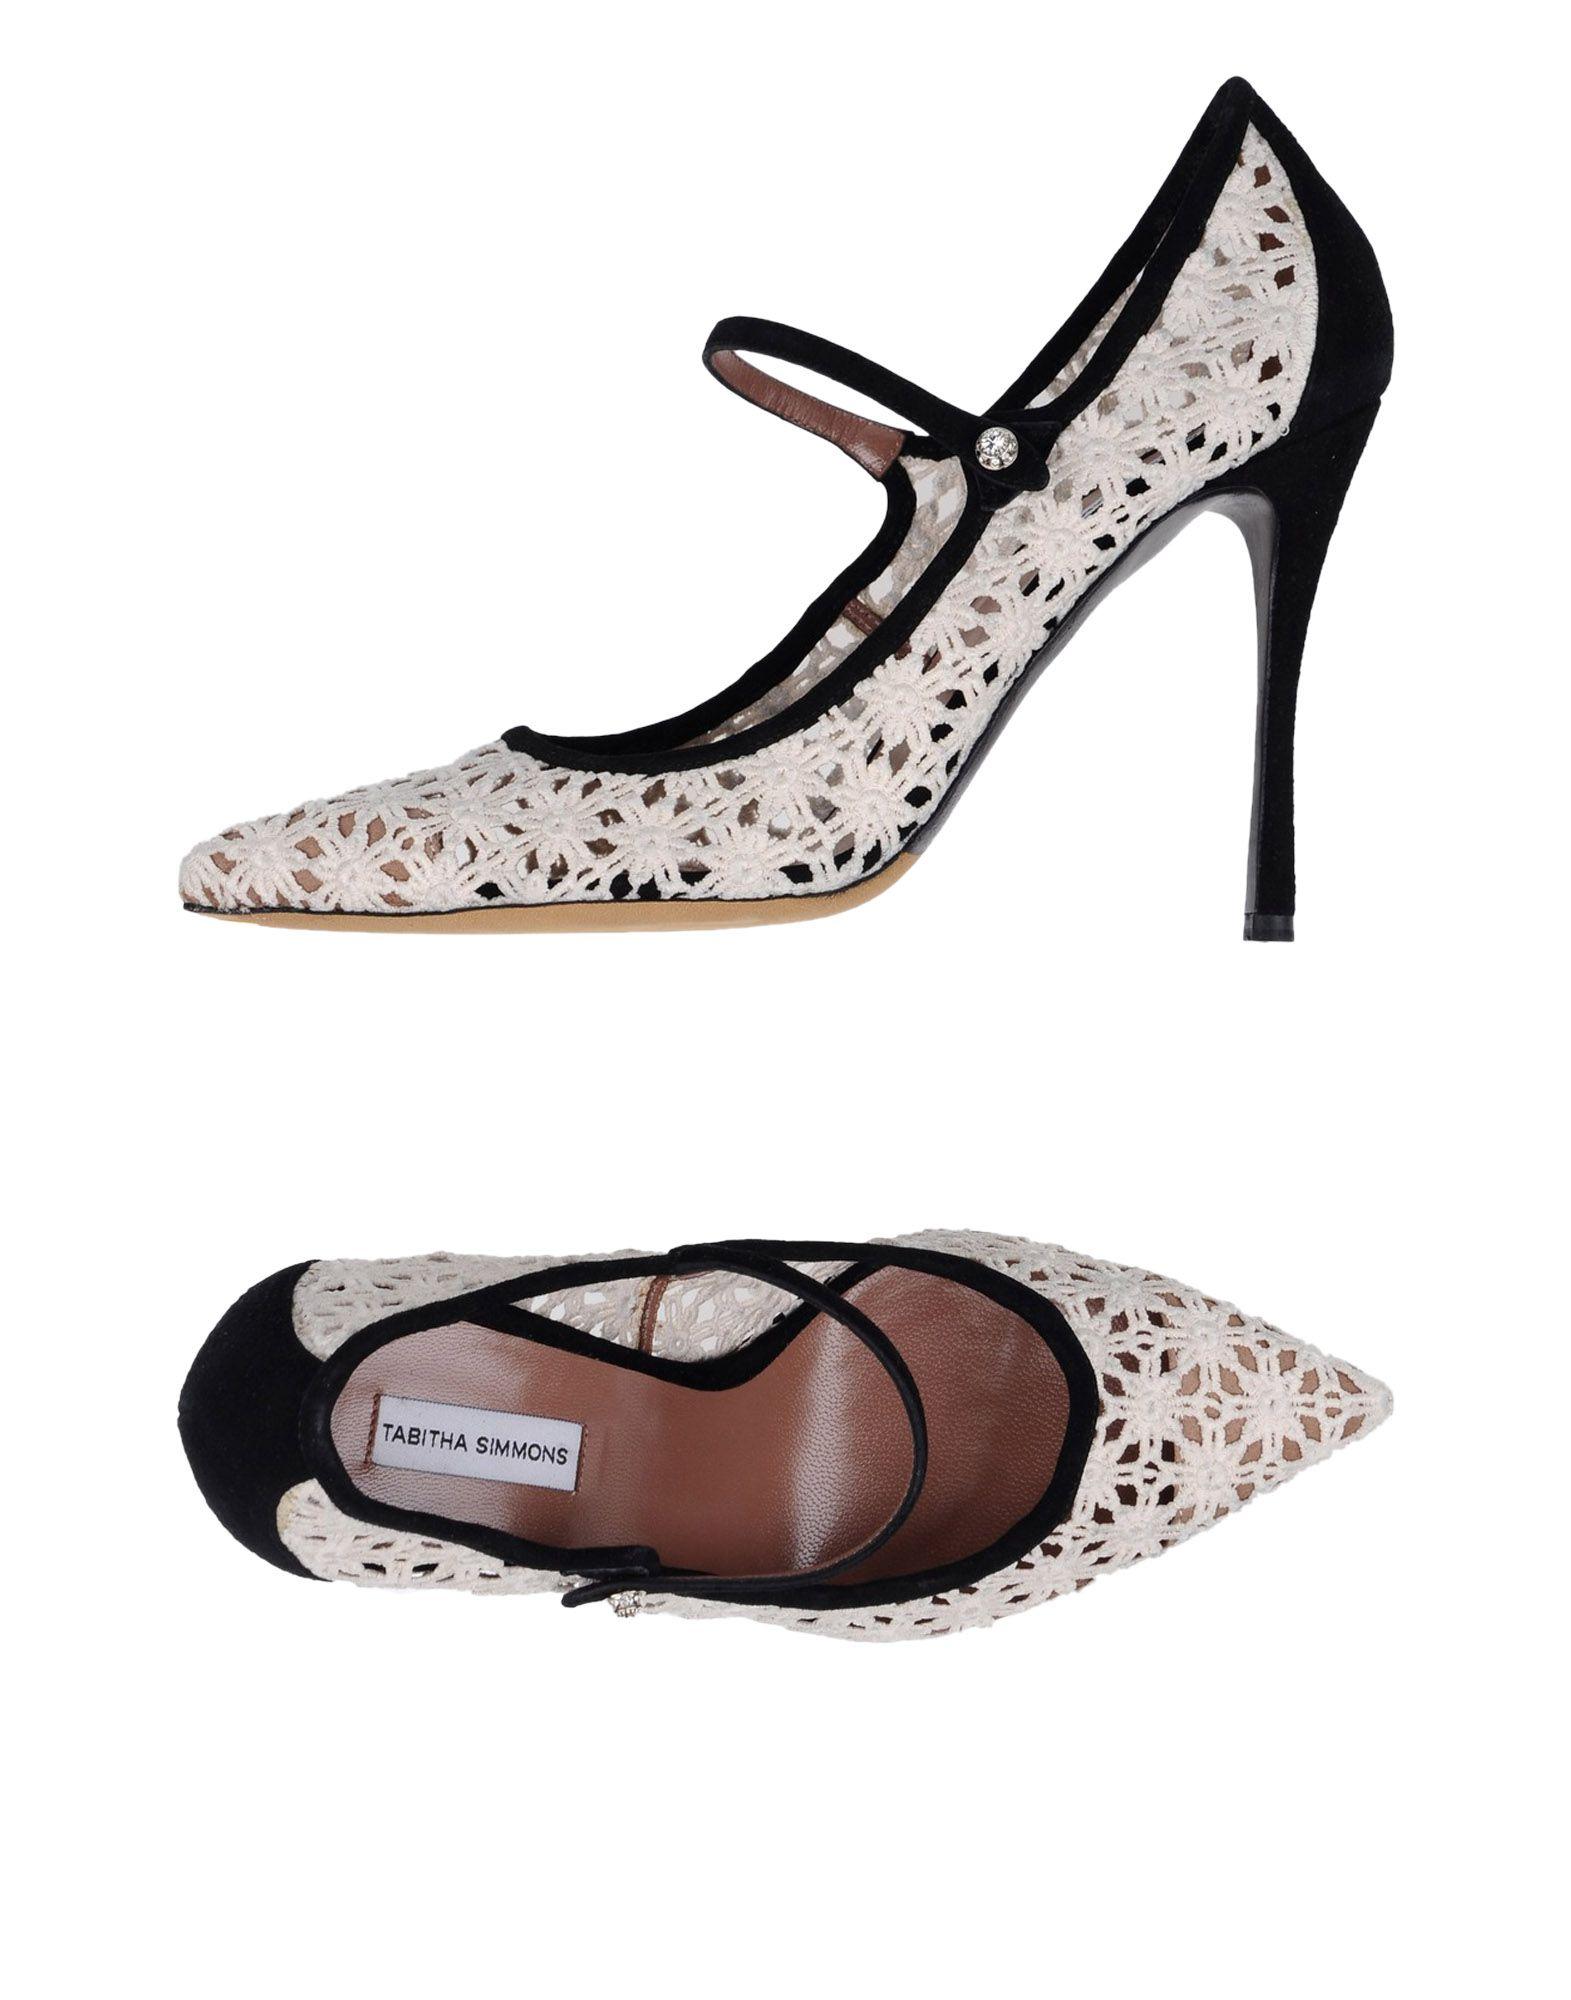 Tabitha Tabitha Tabitha Simmons Pumps Damen  11347371JV Beliebte Schuhe f1ec72